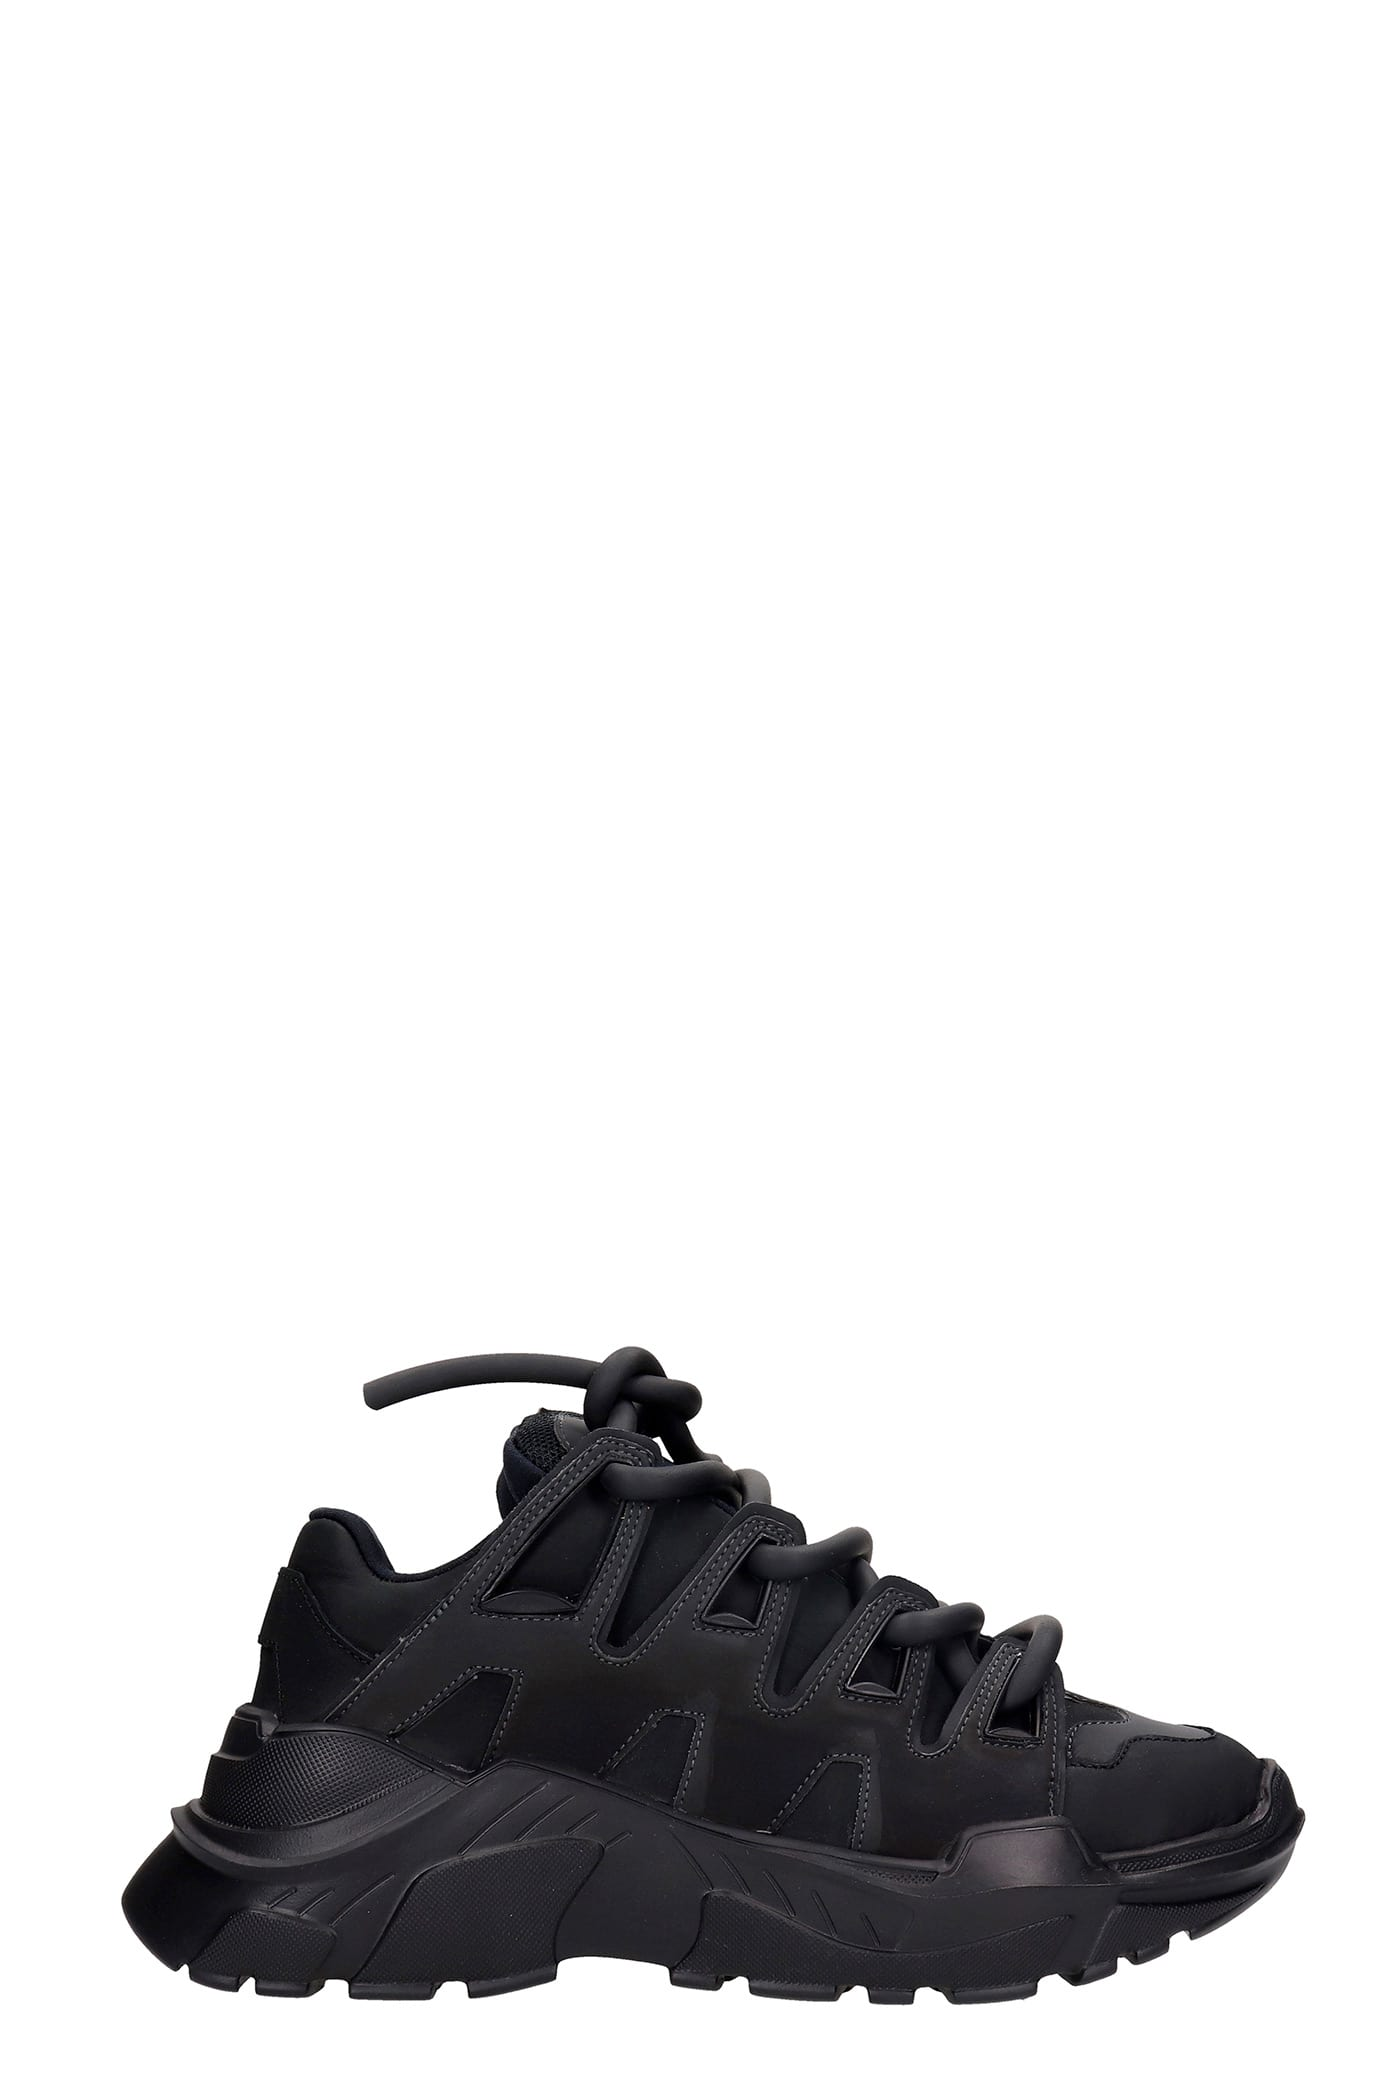 Ozzy Sneakers In Black Rubber/plasic